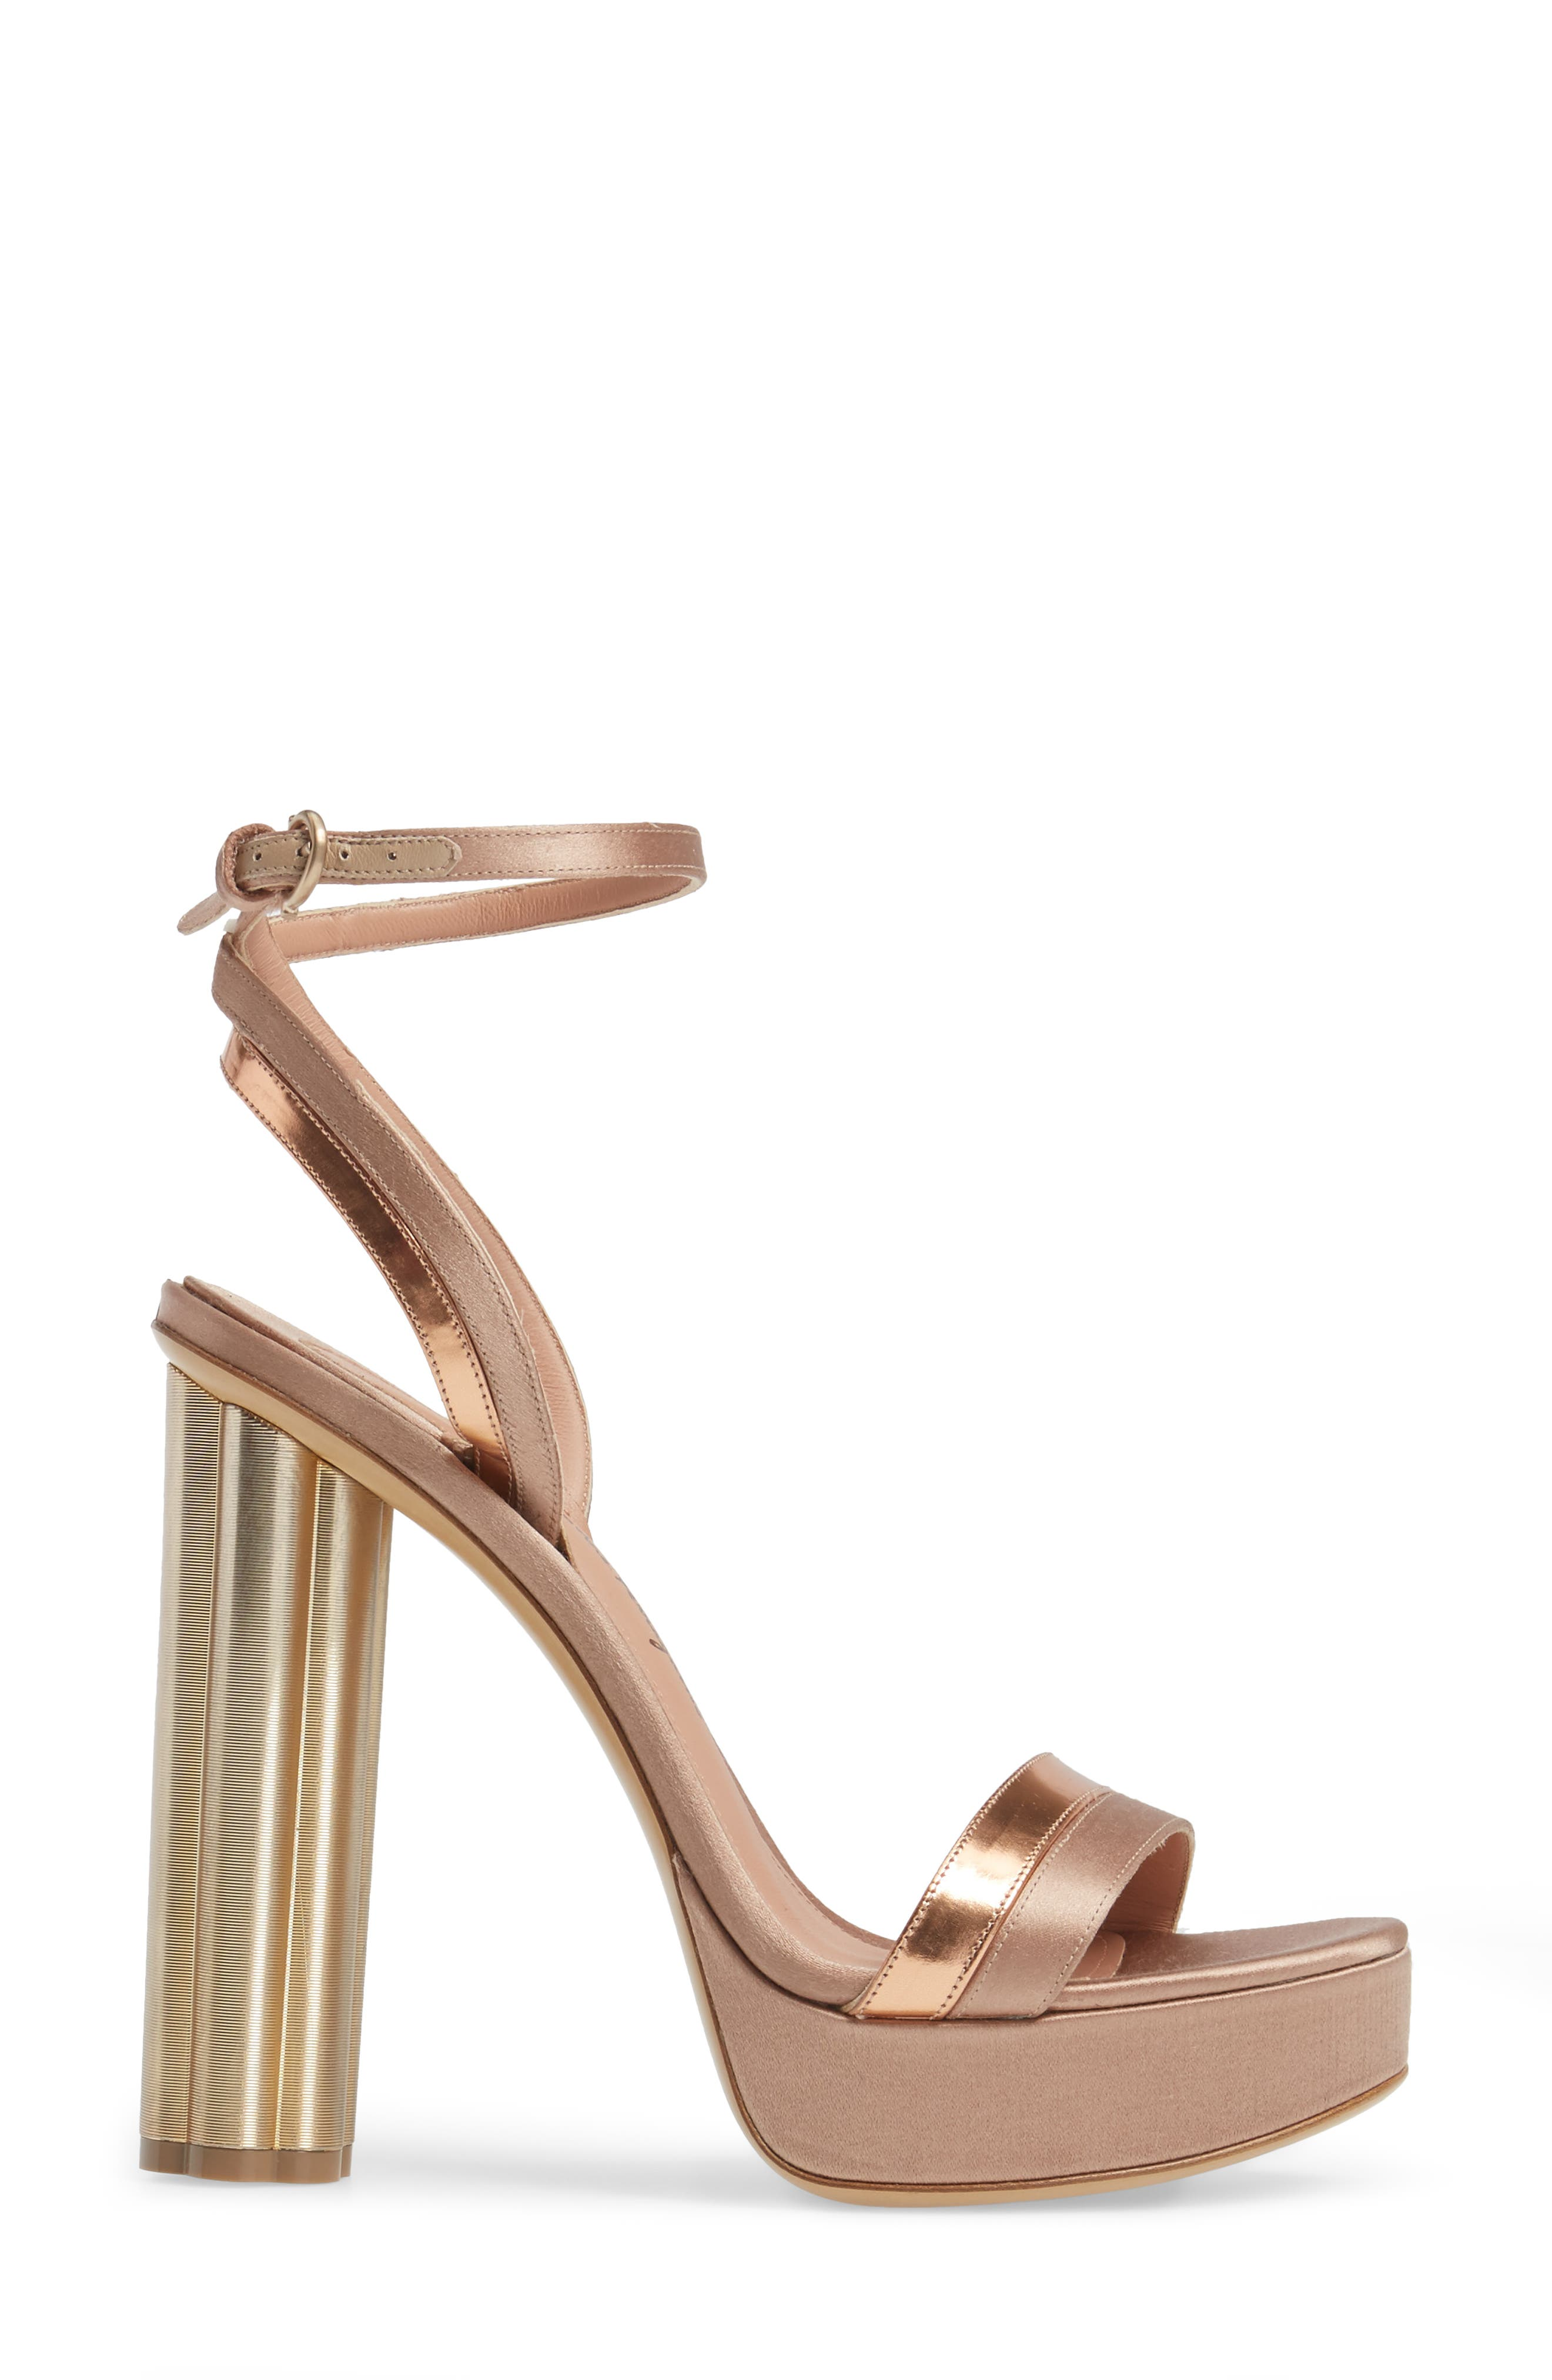 Ankle Strap Platform Sandal,                             Alternate thumbnail 3, color,                             710